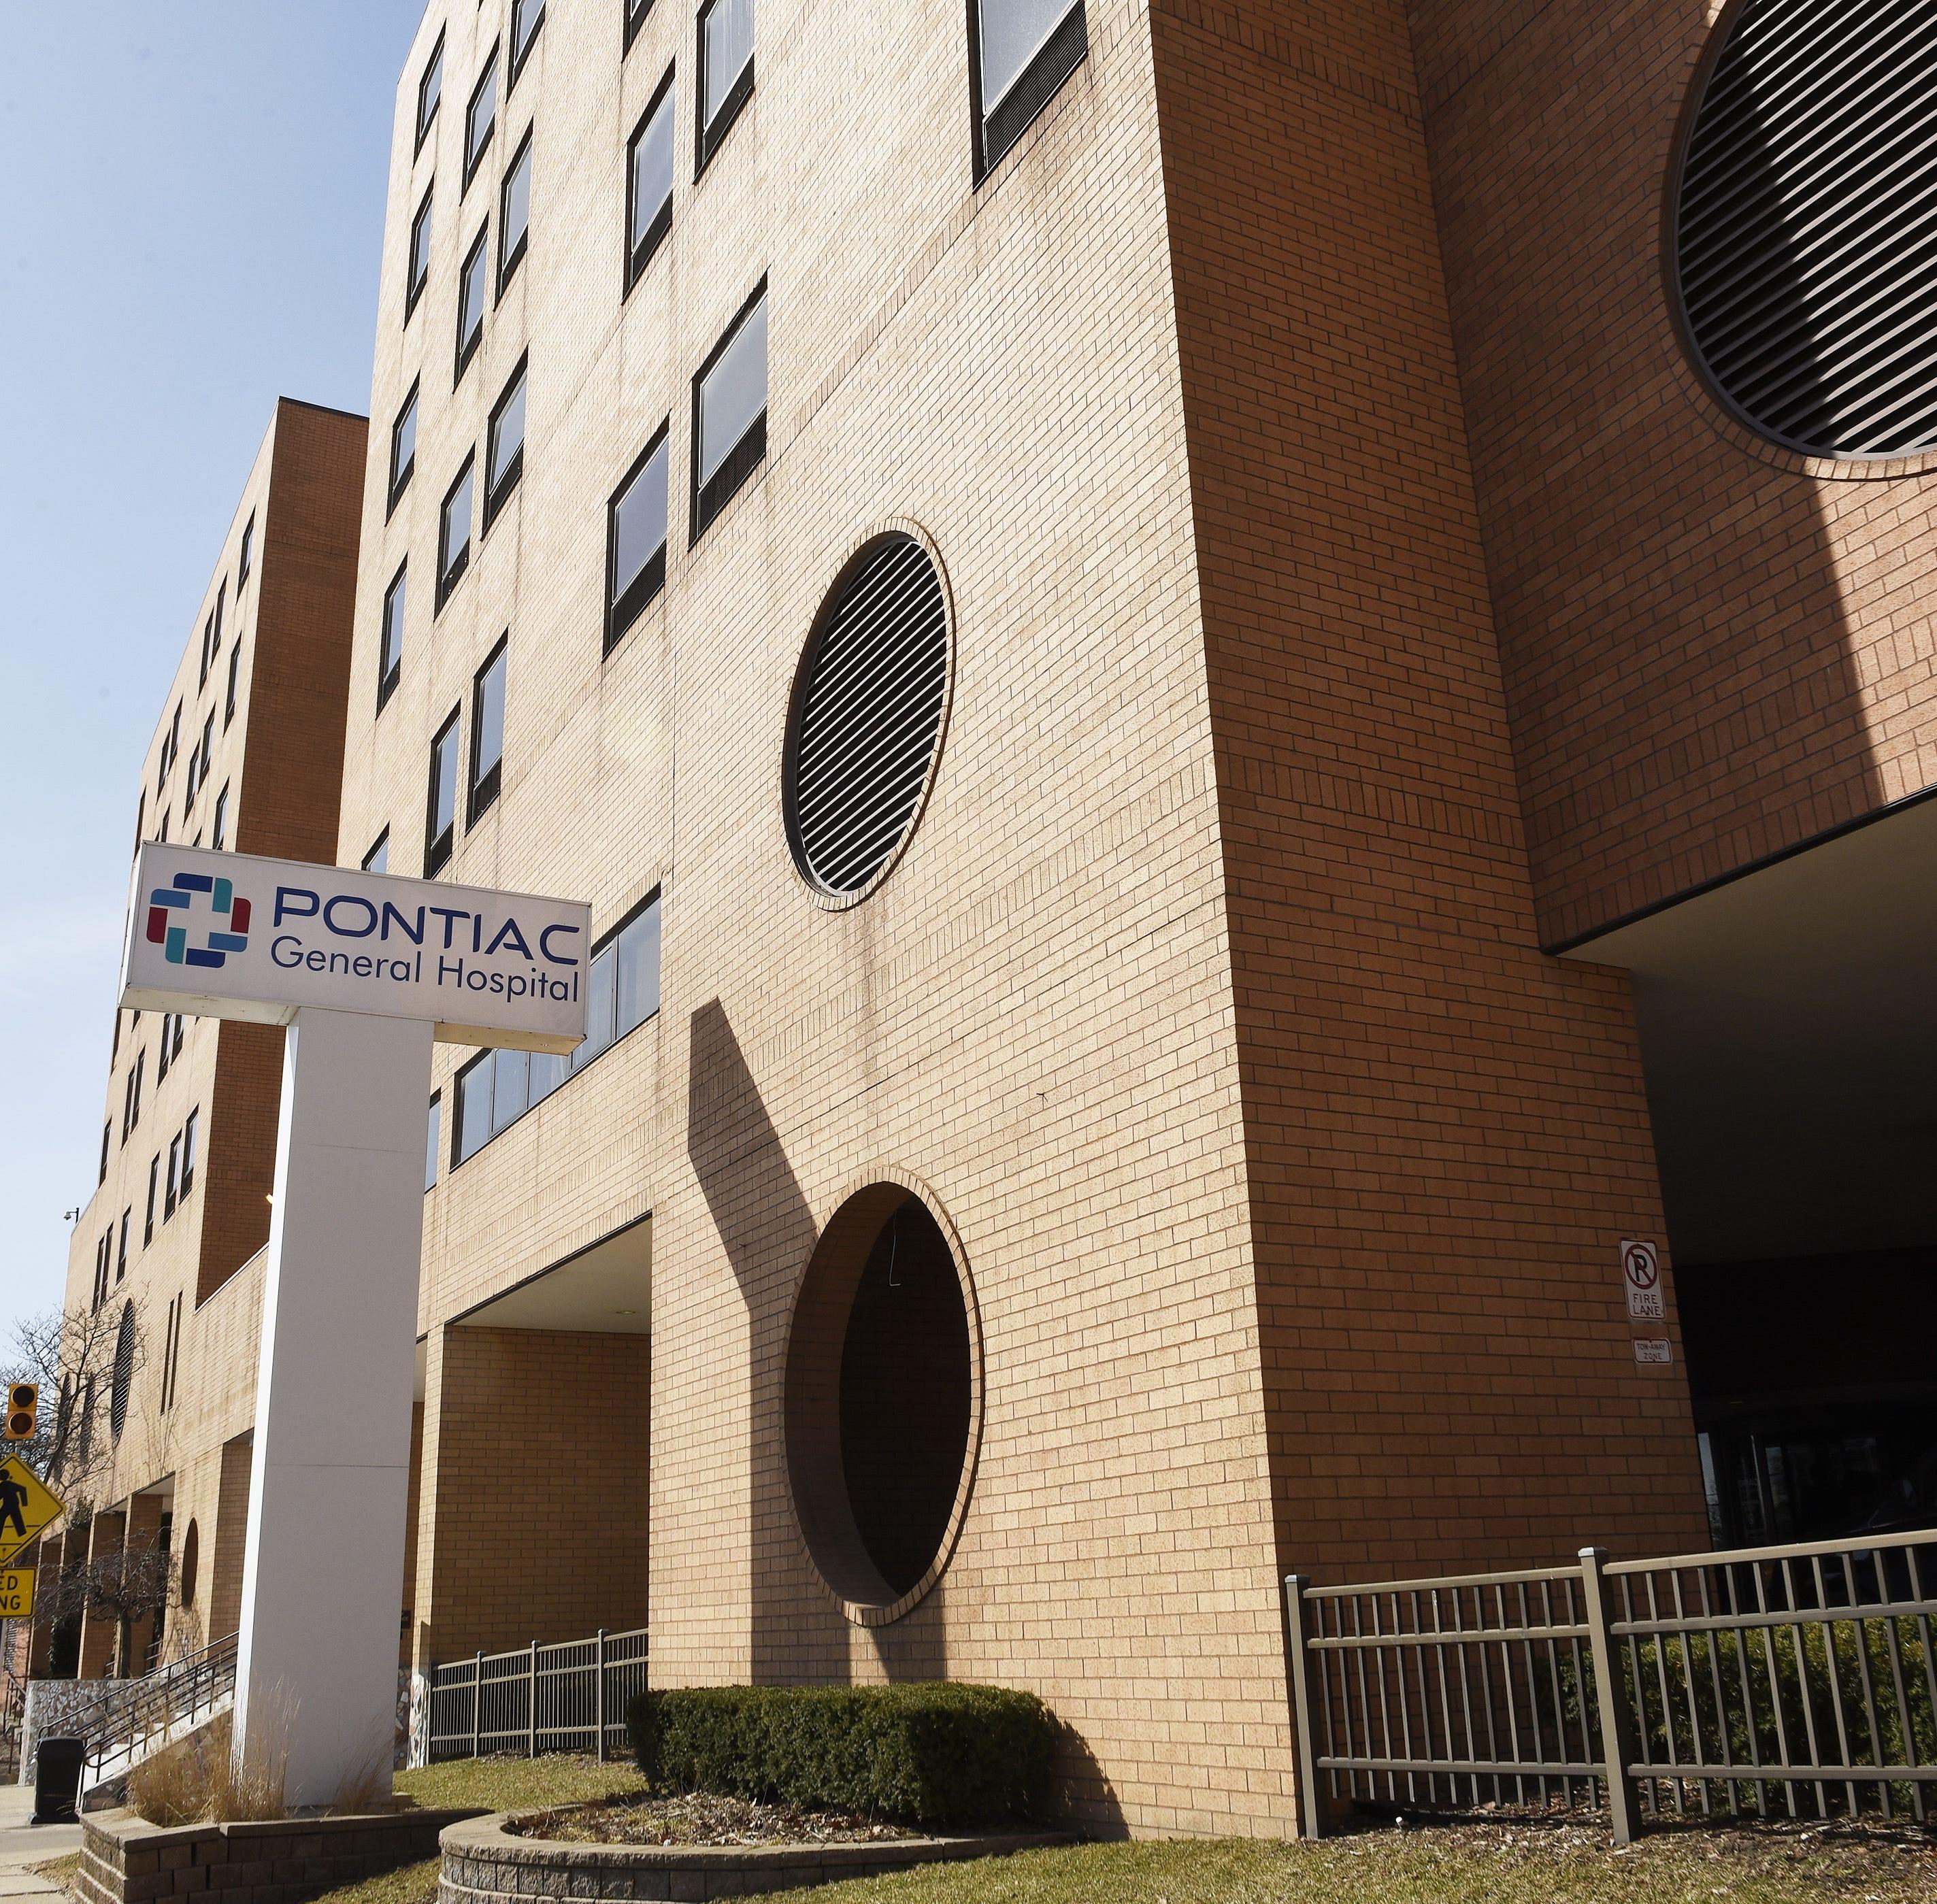 Controversial opioid detox helps turn around Pontiac General Hospital